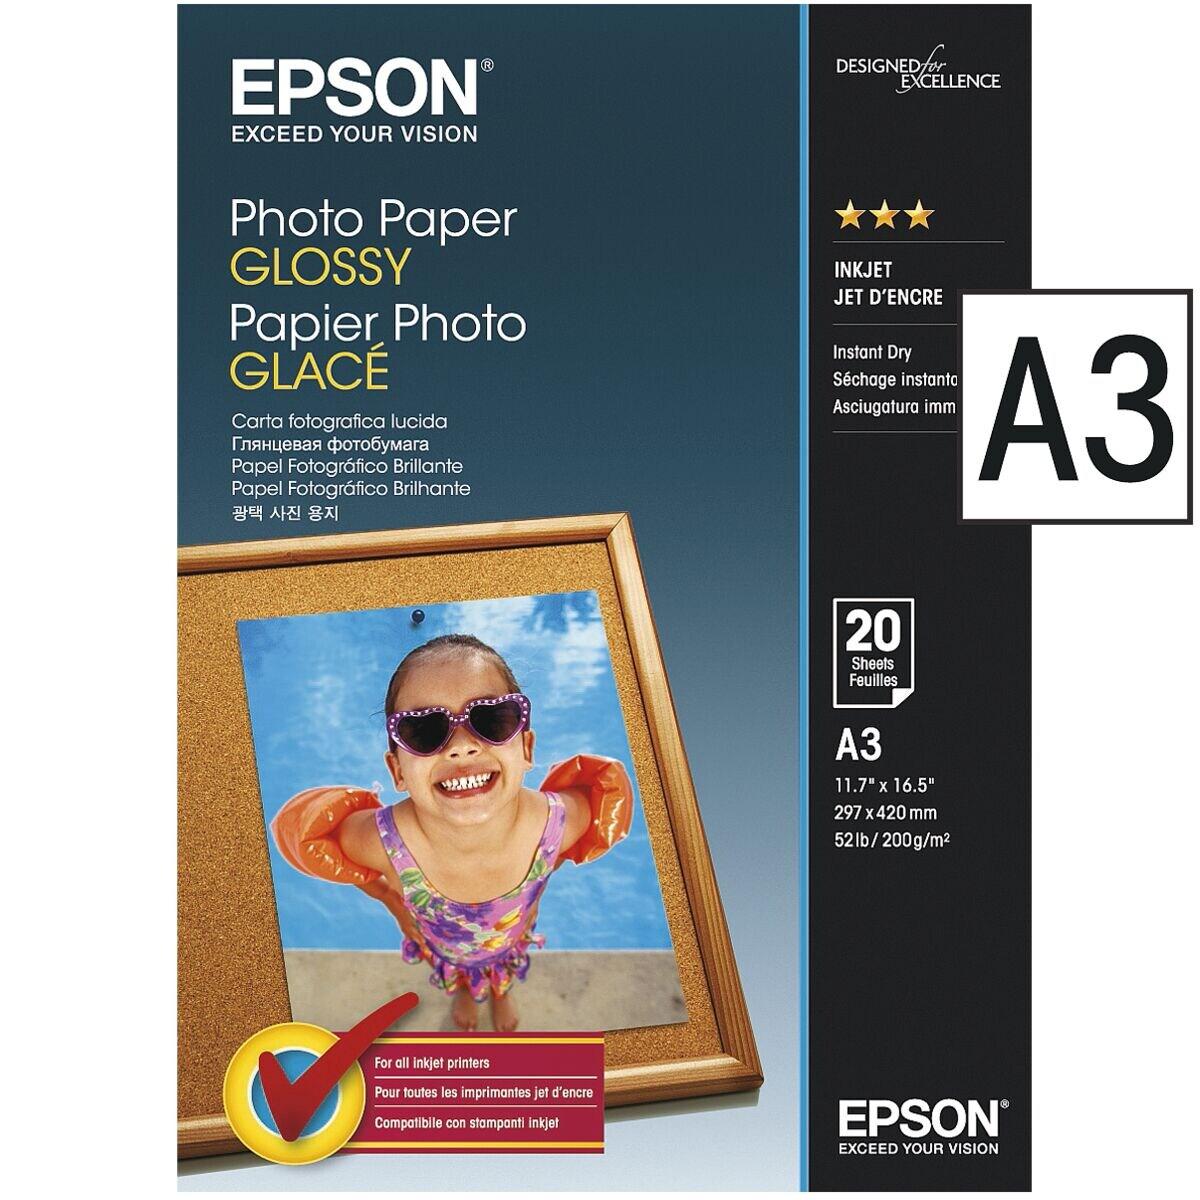 Epson Fotopapier »Photo Paper Glossy« (A3 - 20 Blatt)